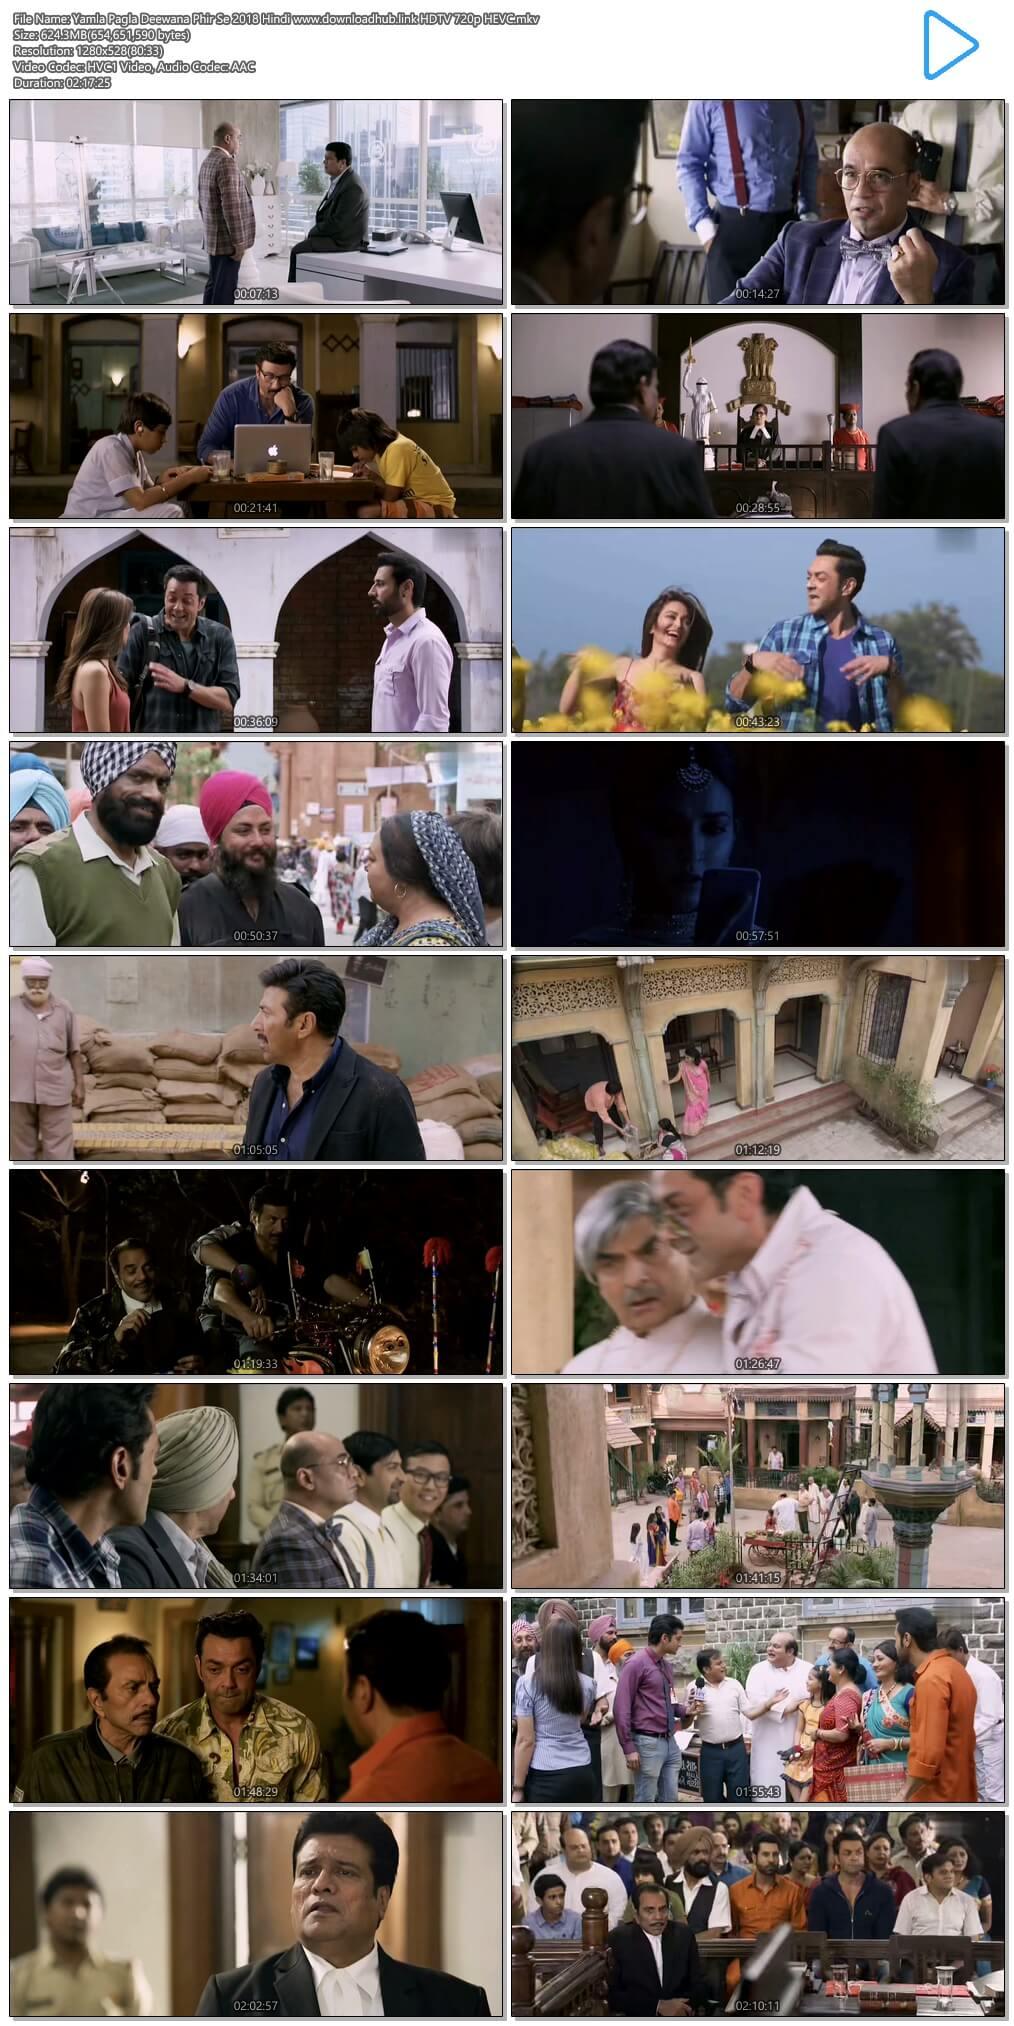 Yamla Pagla Deewana Phir Se 2018 Hindi 600MB HDTV 720p HEVC